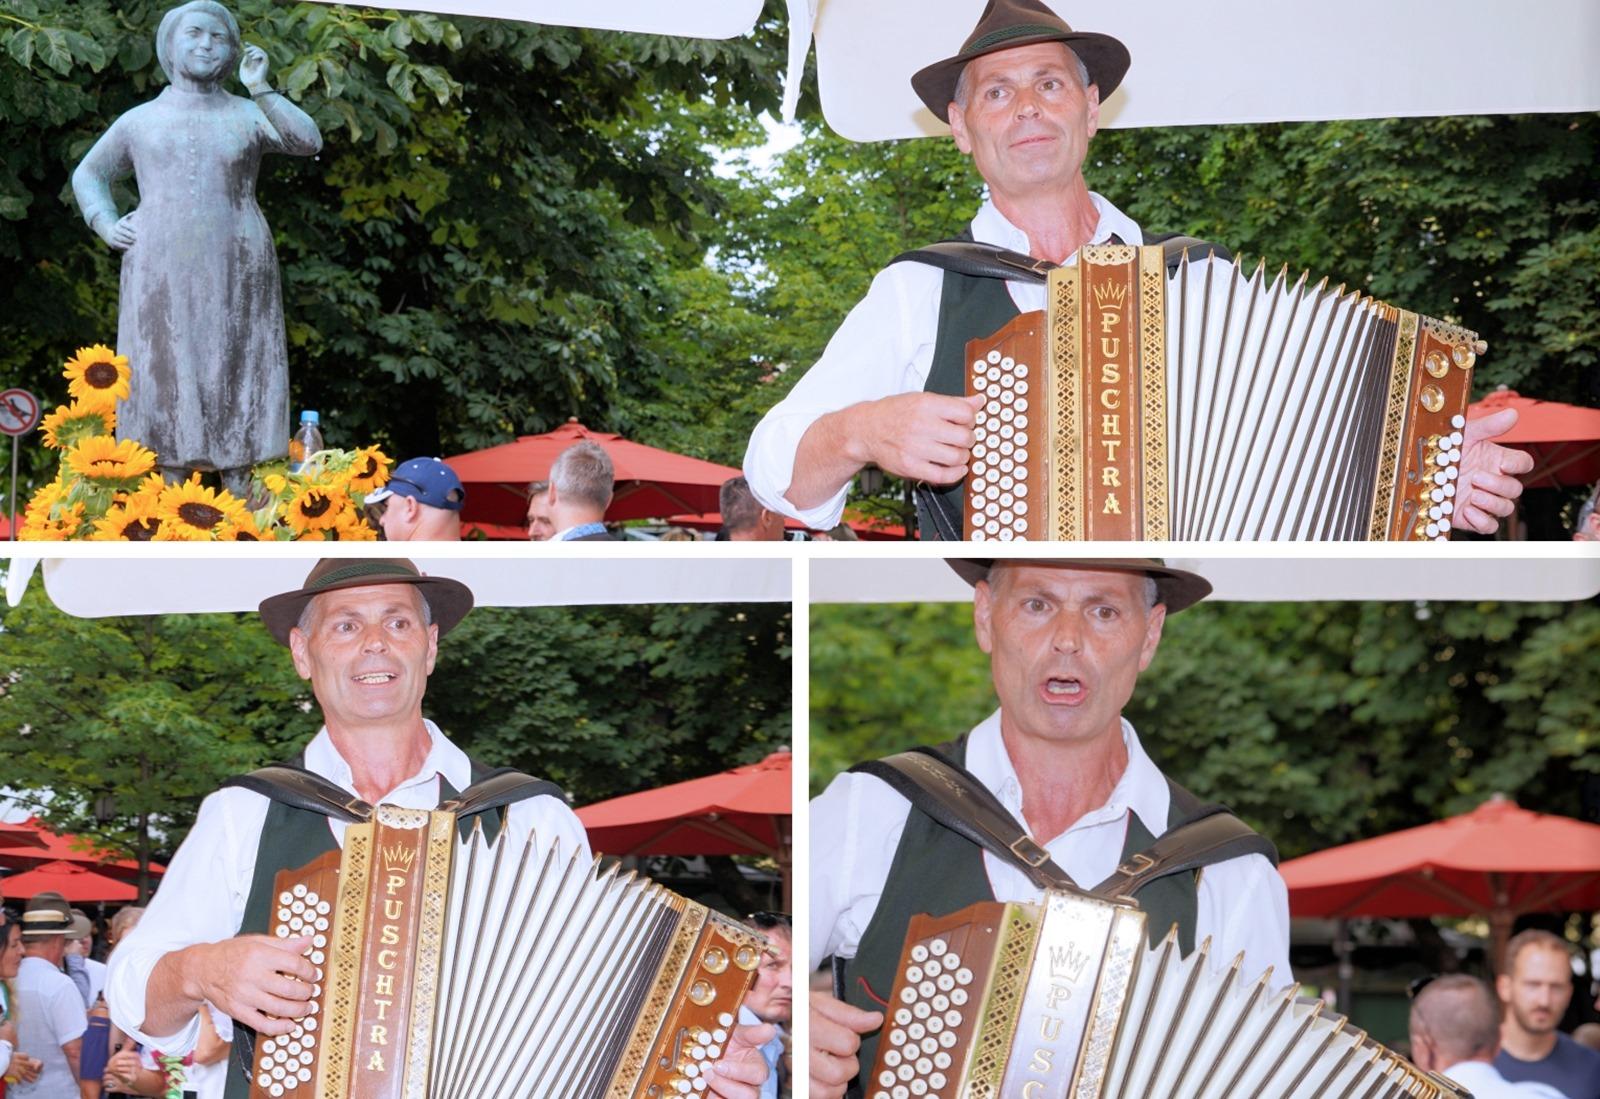 Georg Klaffenbacher